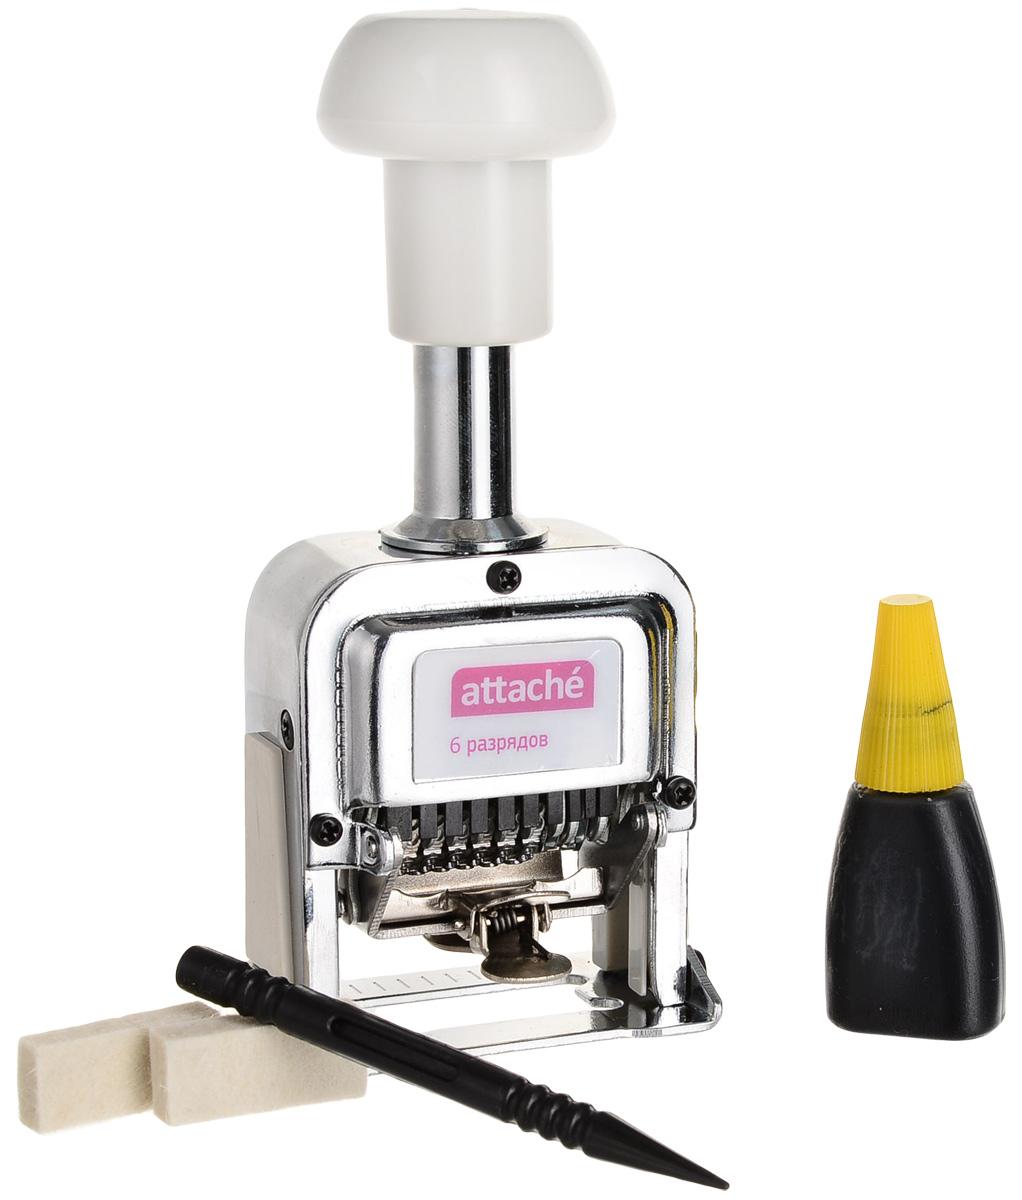 Attache Нумератор шестиразрядный 4,8 мм